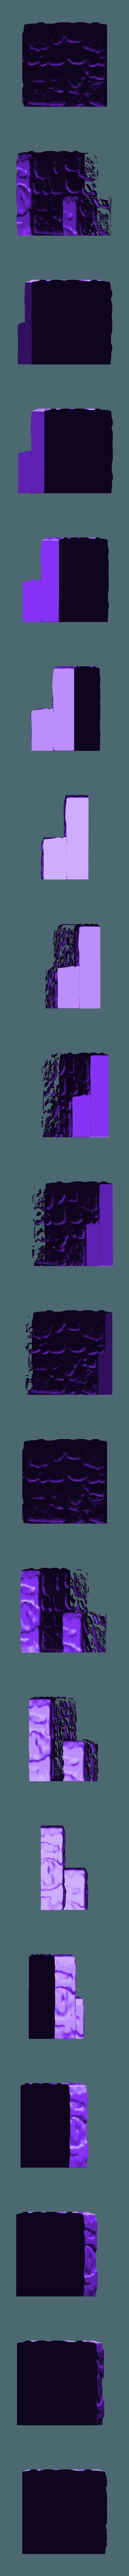 cavern_elevated_ascent_corner_2x2.stl Download free STL file Cavern Ascents/ Steps (Openforge 2.0 compatible) • 3D printer object, Poxos